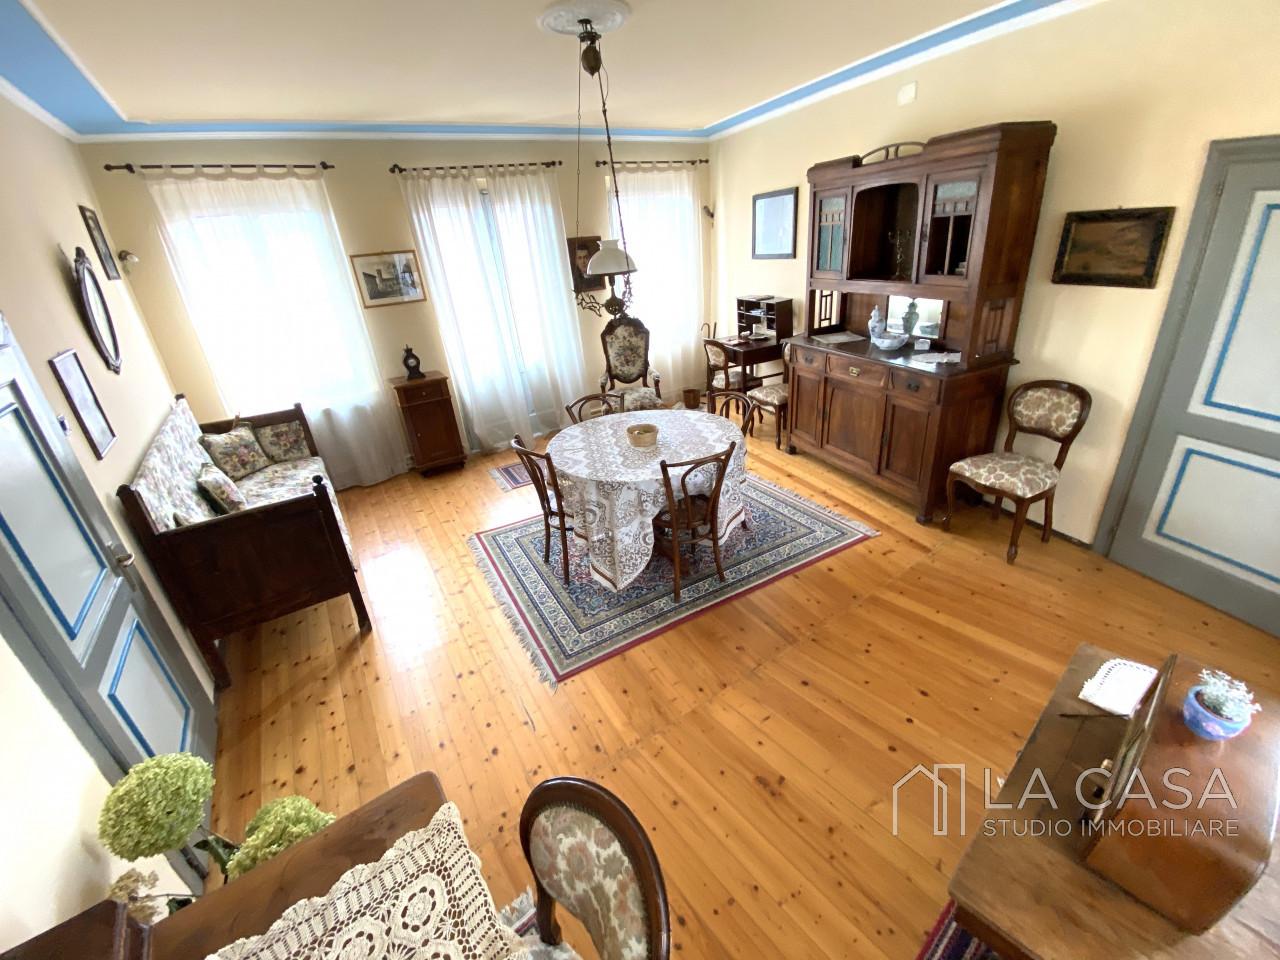 Palazzo plurifamiliare in vendita a Valvasone Arzene - Rif. P3 https://images.gestionaleimmobiliare.it/foto/annunci/200827/2284141/1280x1280/008__img_3720_wmk_0.jpg